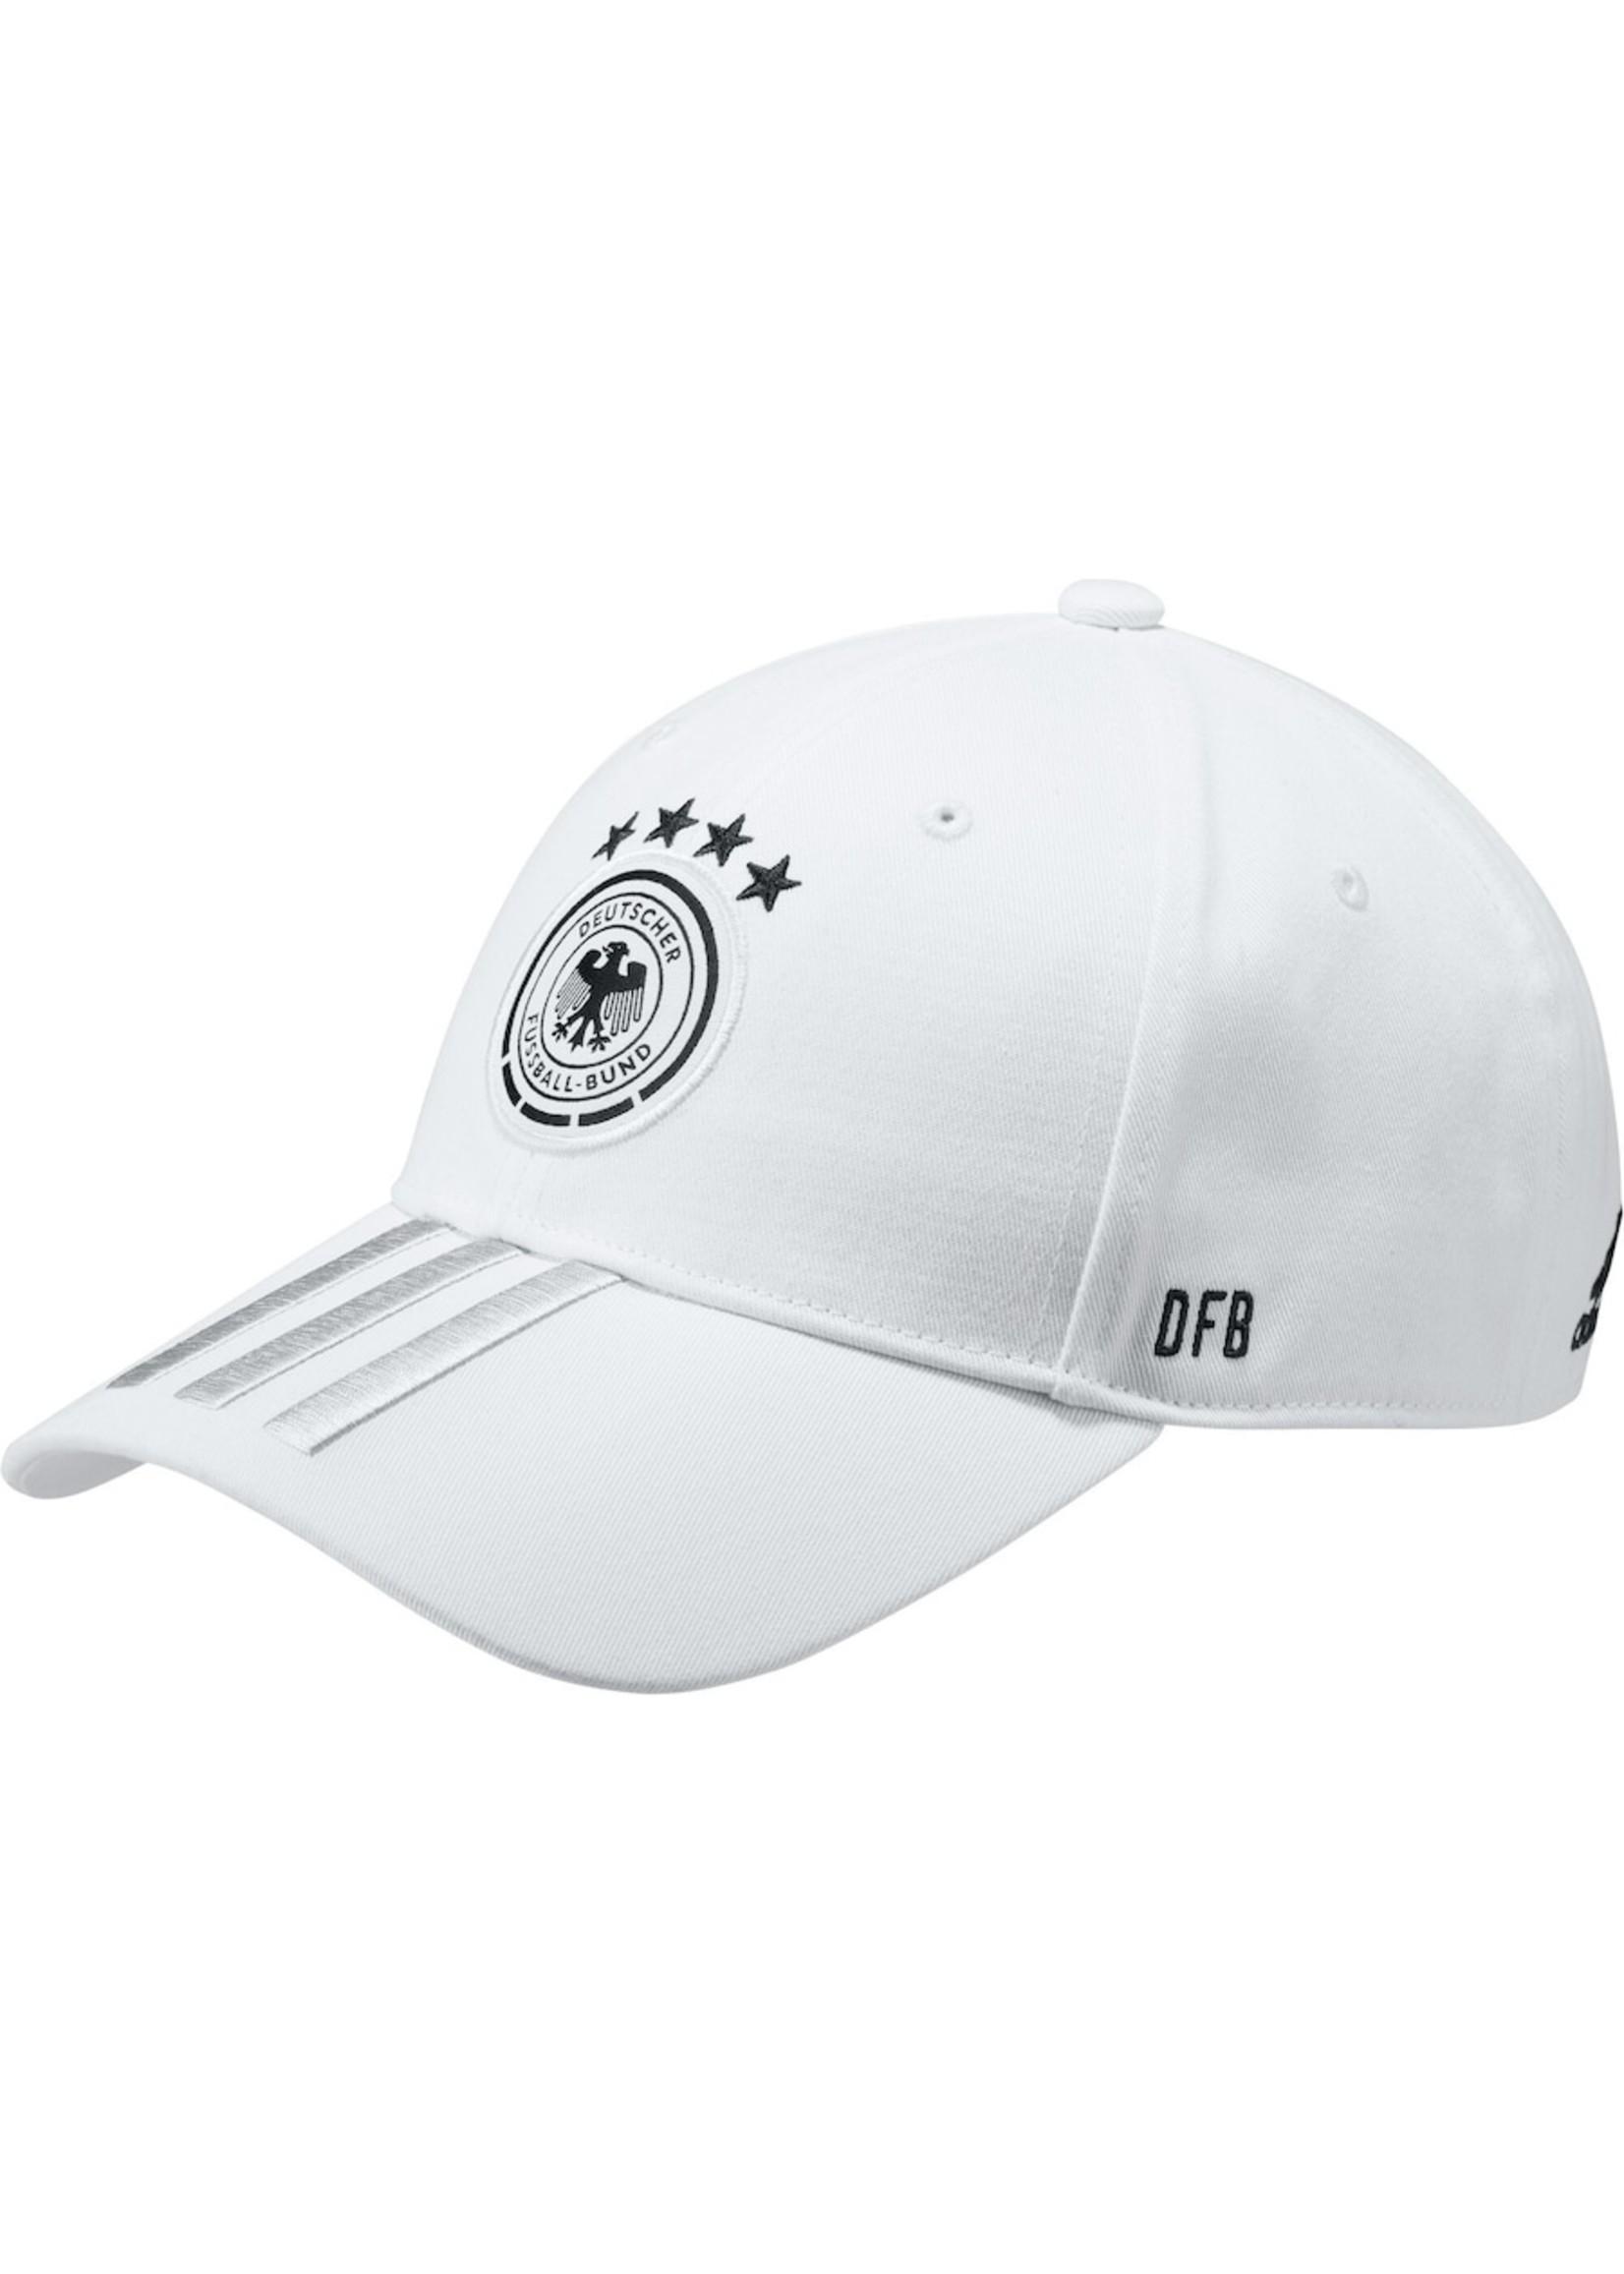 Adidas Germany Cap - White